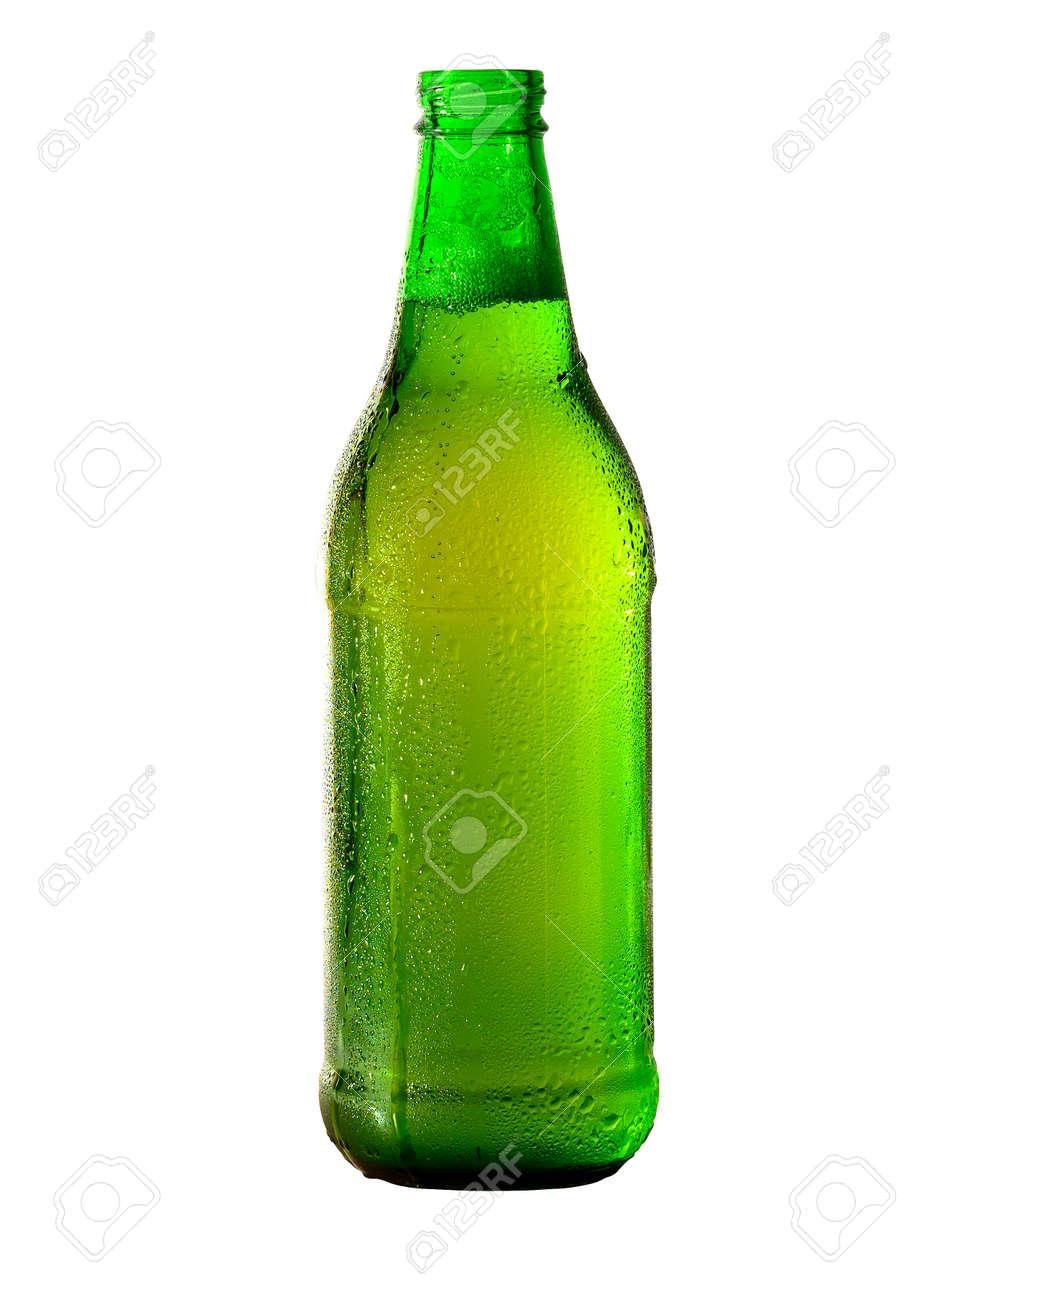 Green Beer bottle isolated on white. - 171379347